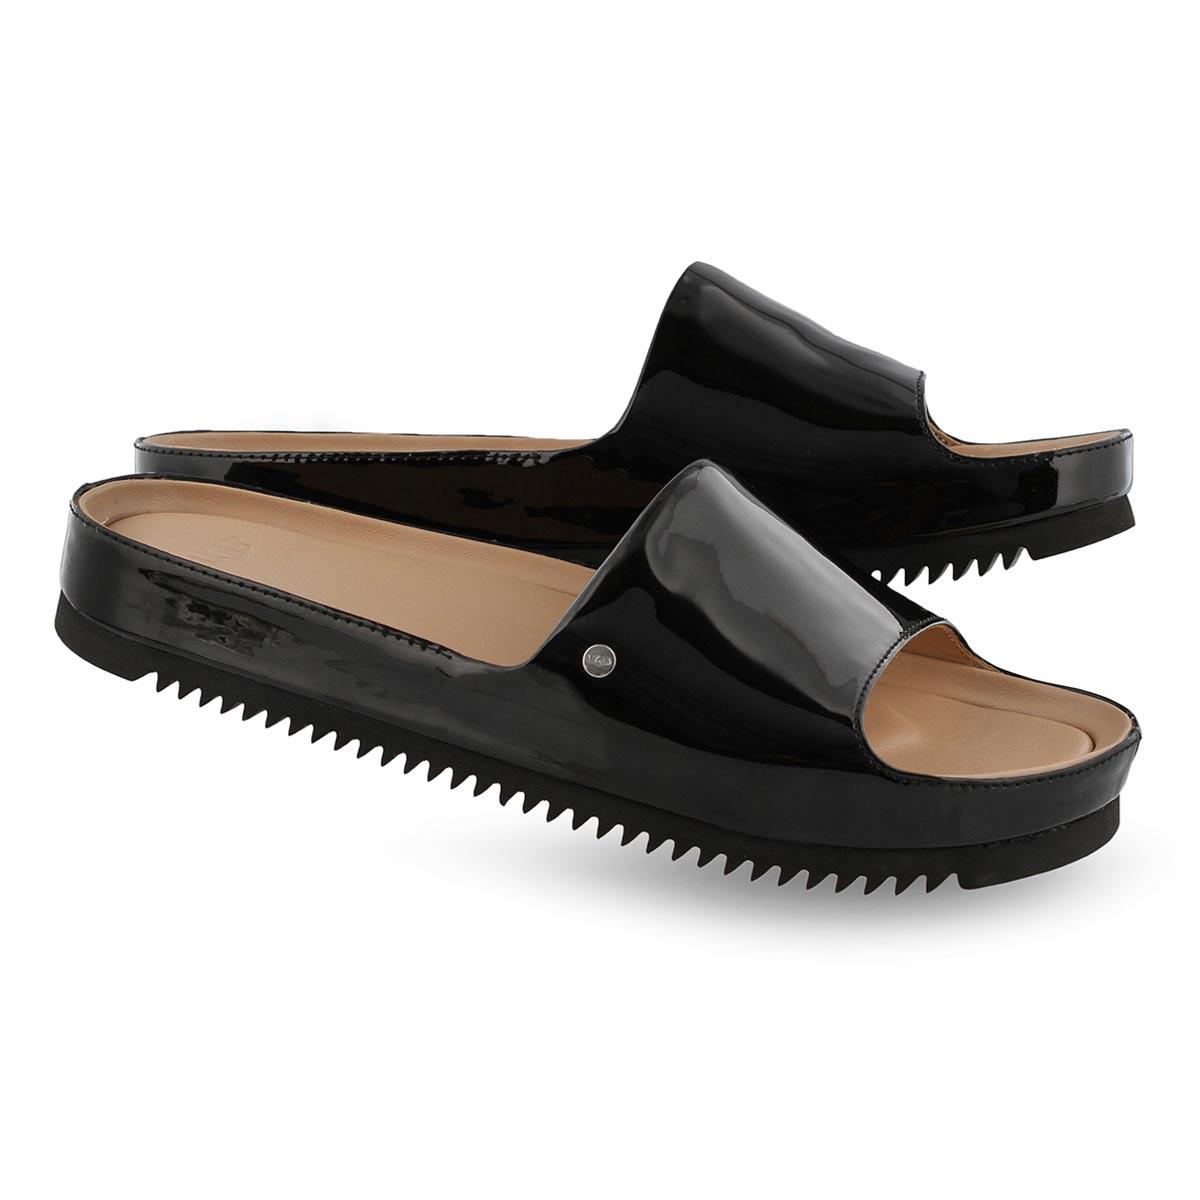 Lds Jane black slide sandal